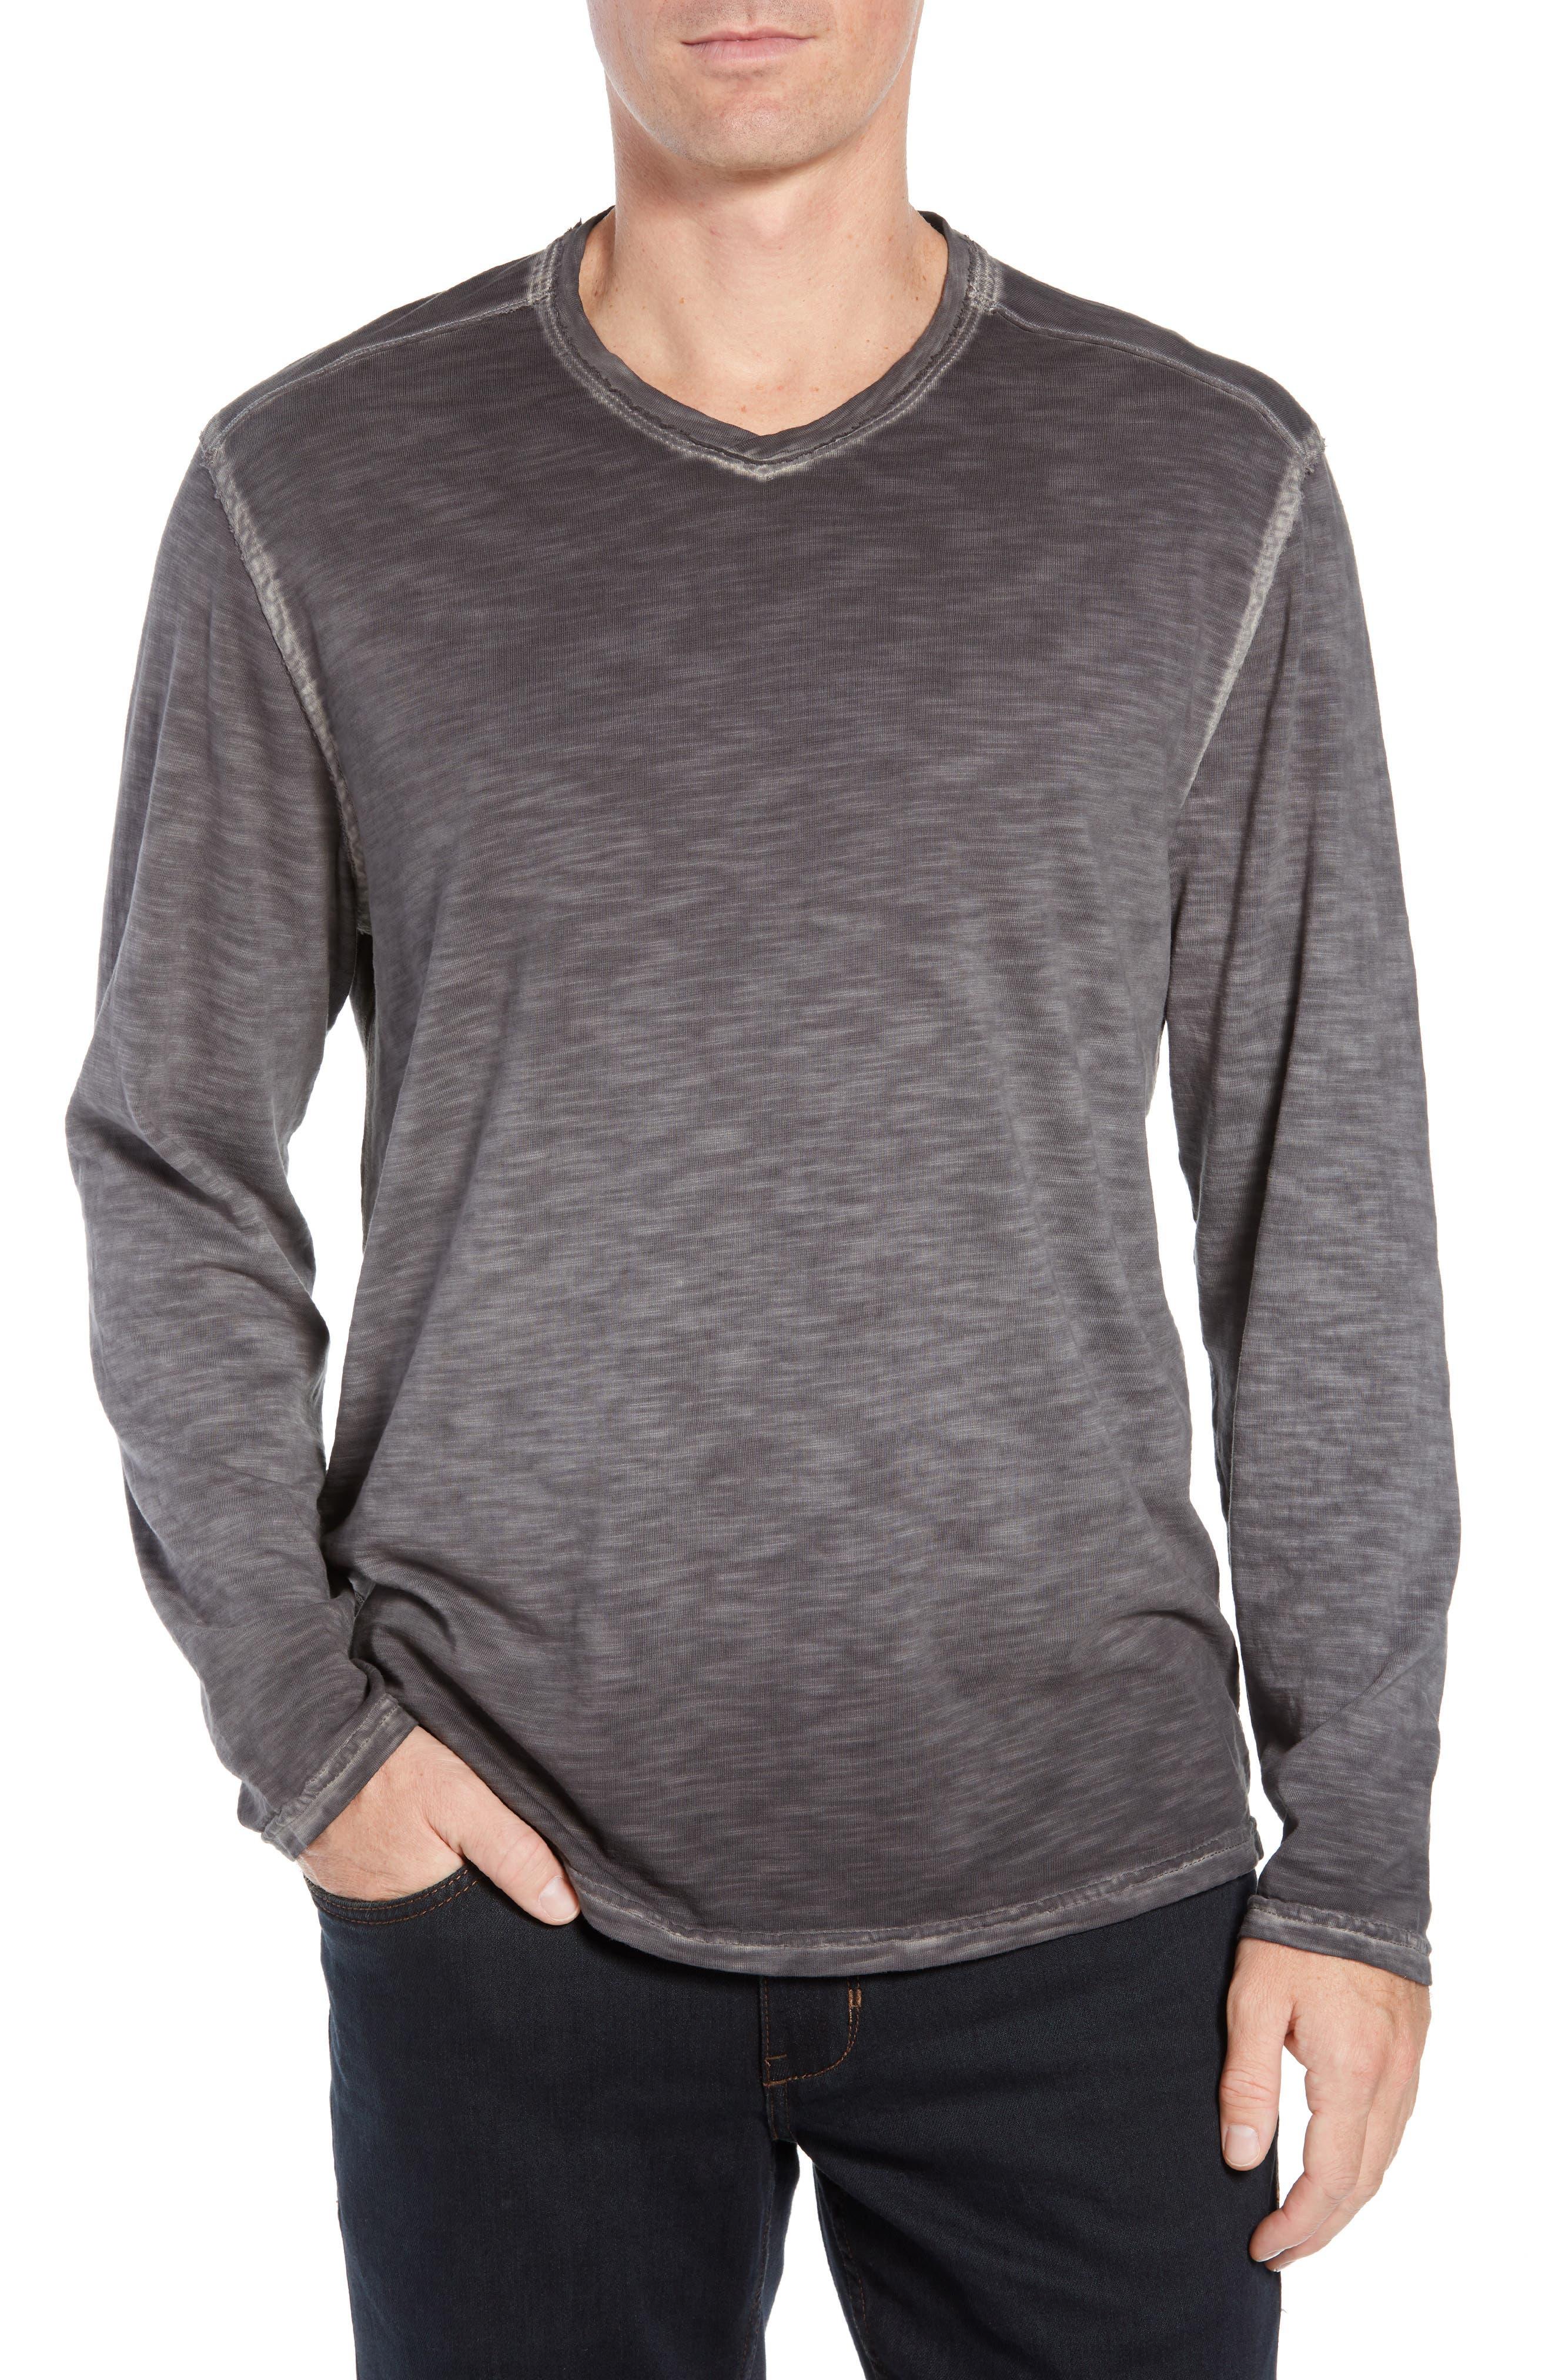 Suncoast Shores Long Sleeve V-Neck T-Shirt,                         Main,                         color, COAL